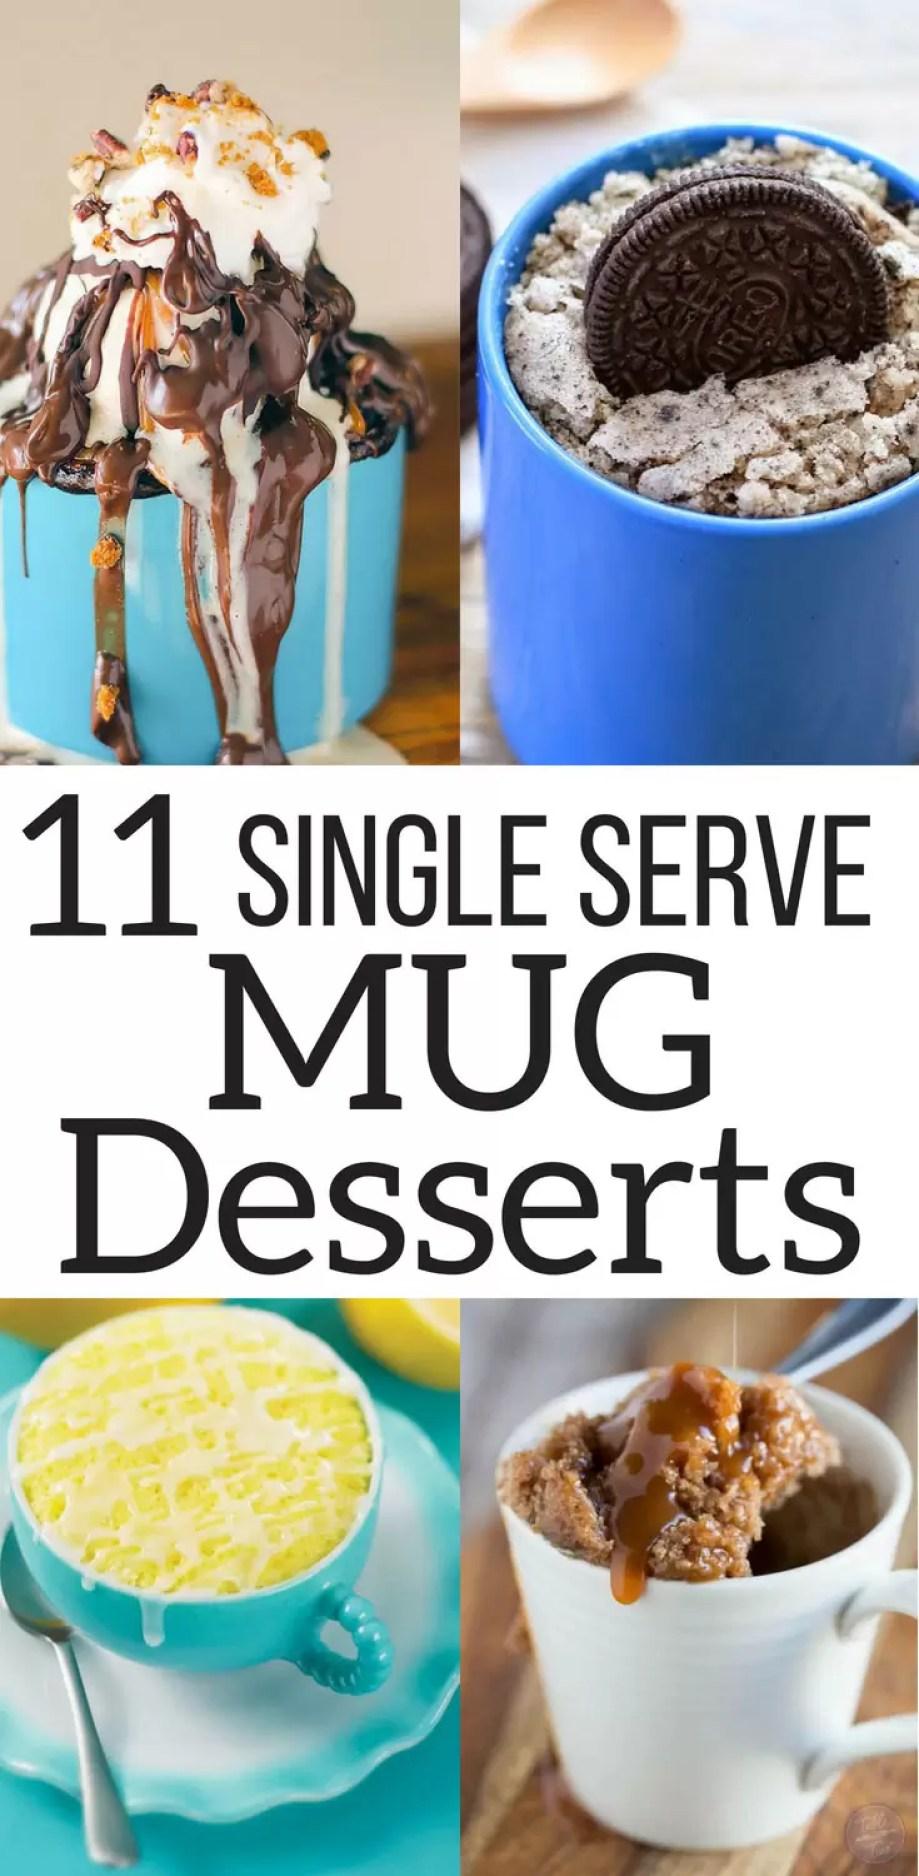 The best single serve mug desserts on the internet! Genius idea for that quick dessert!